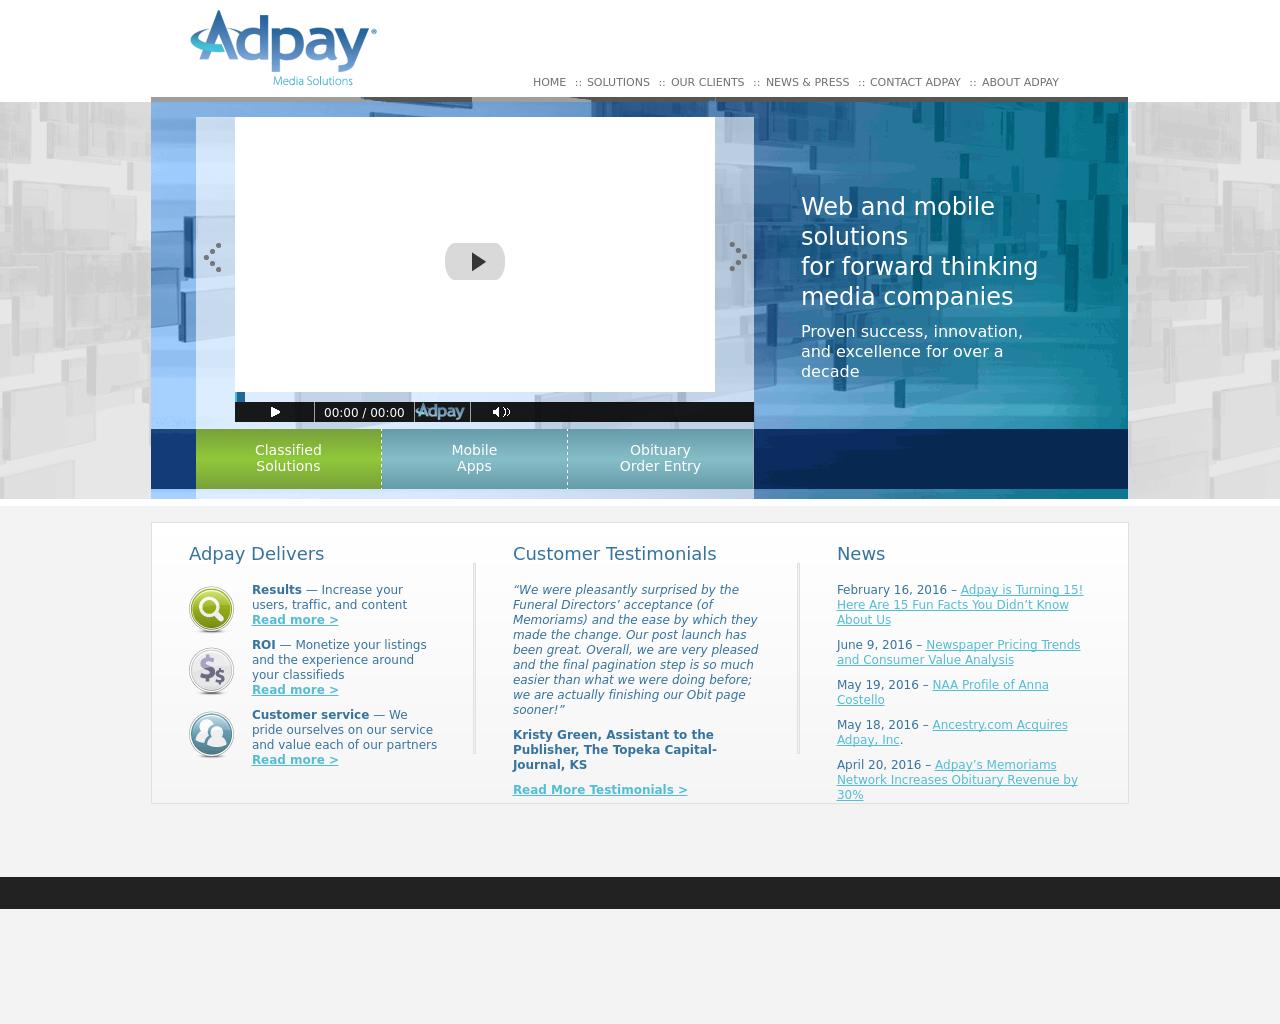 Adpay-Advertising-Reviews-Pricing